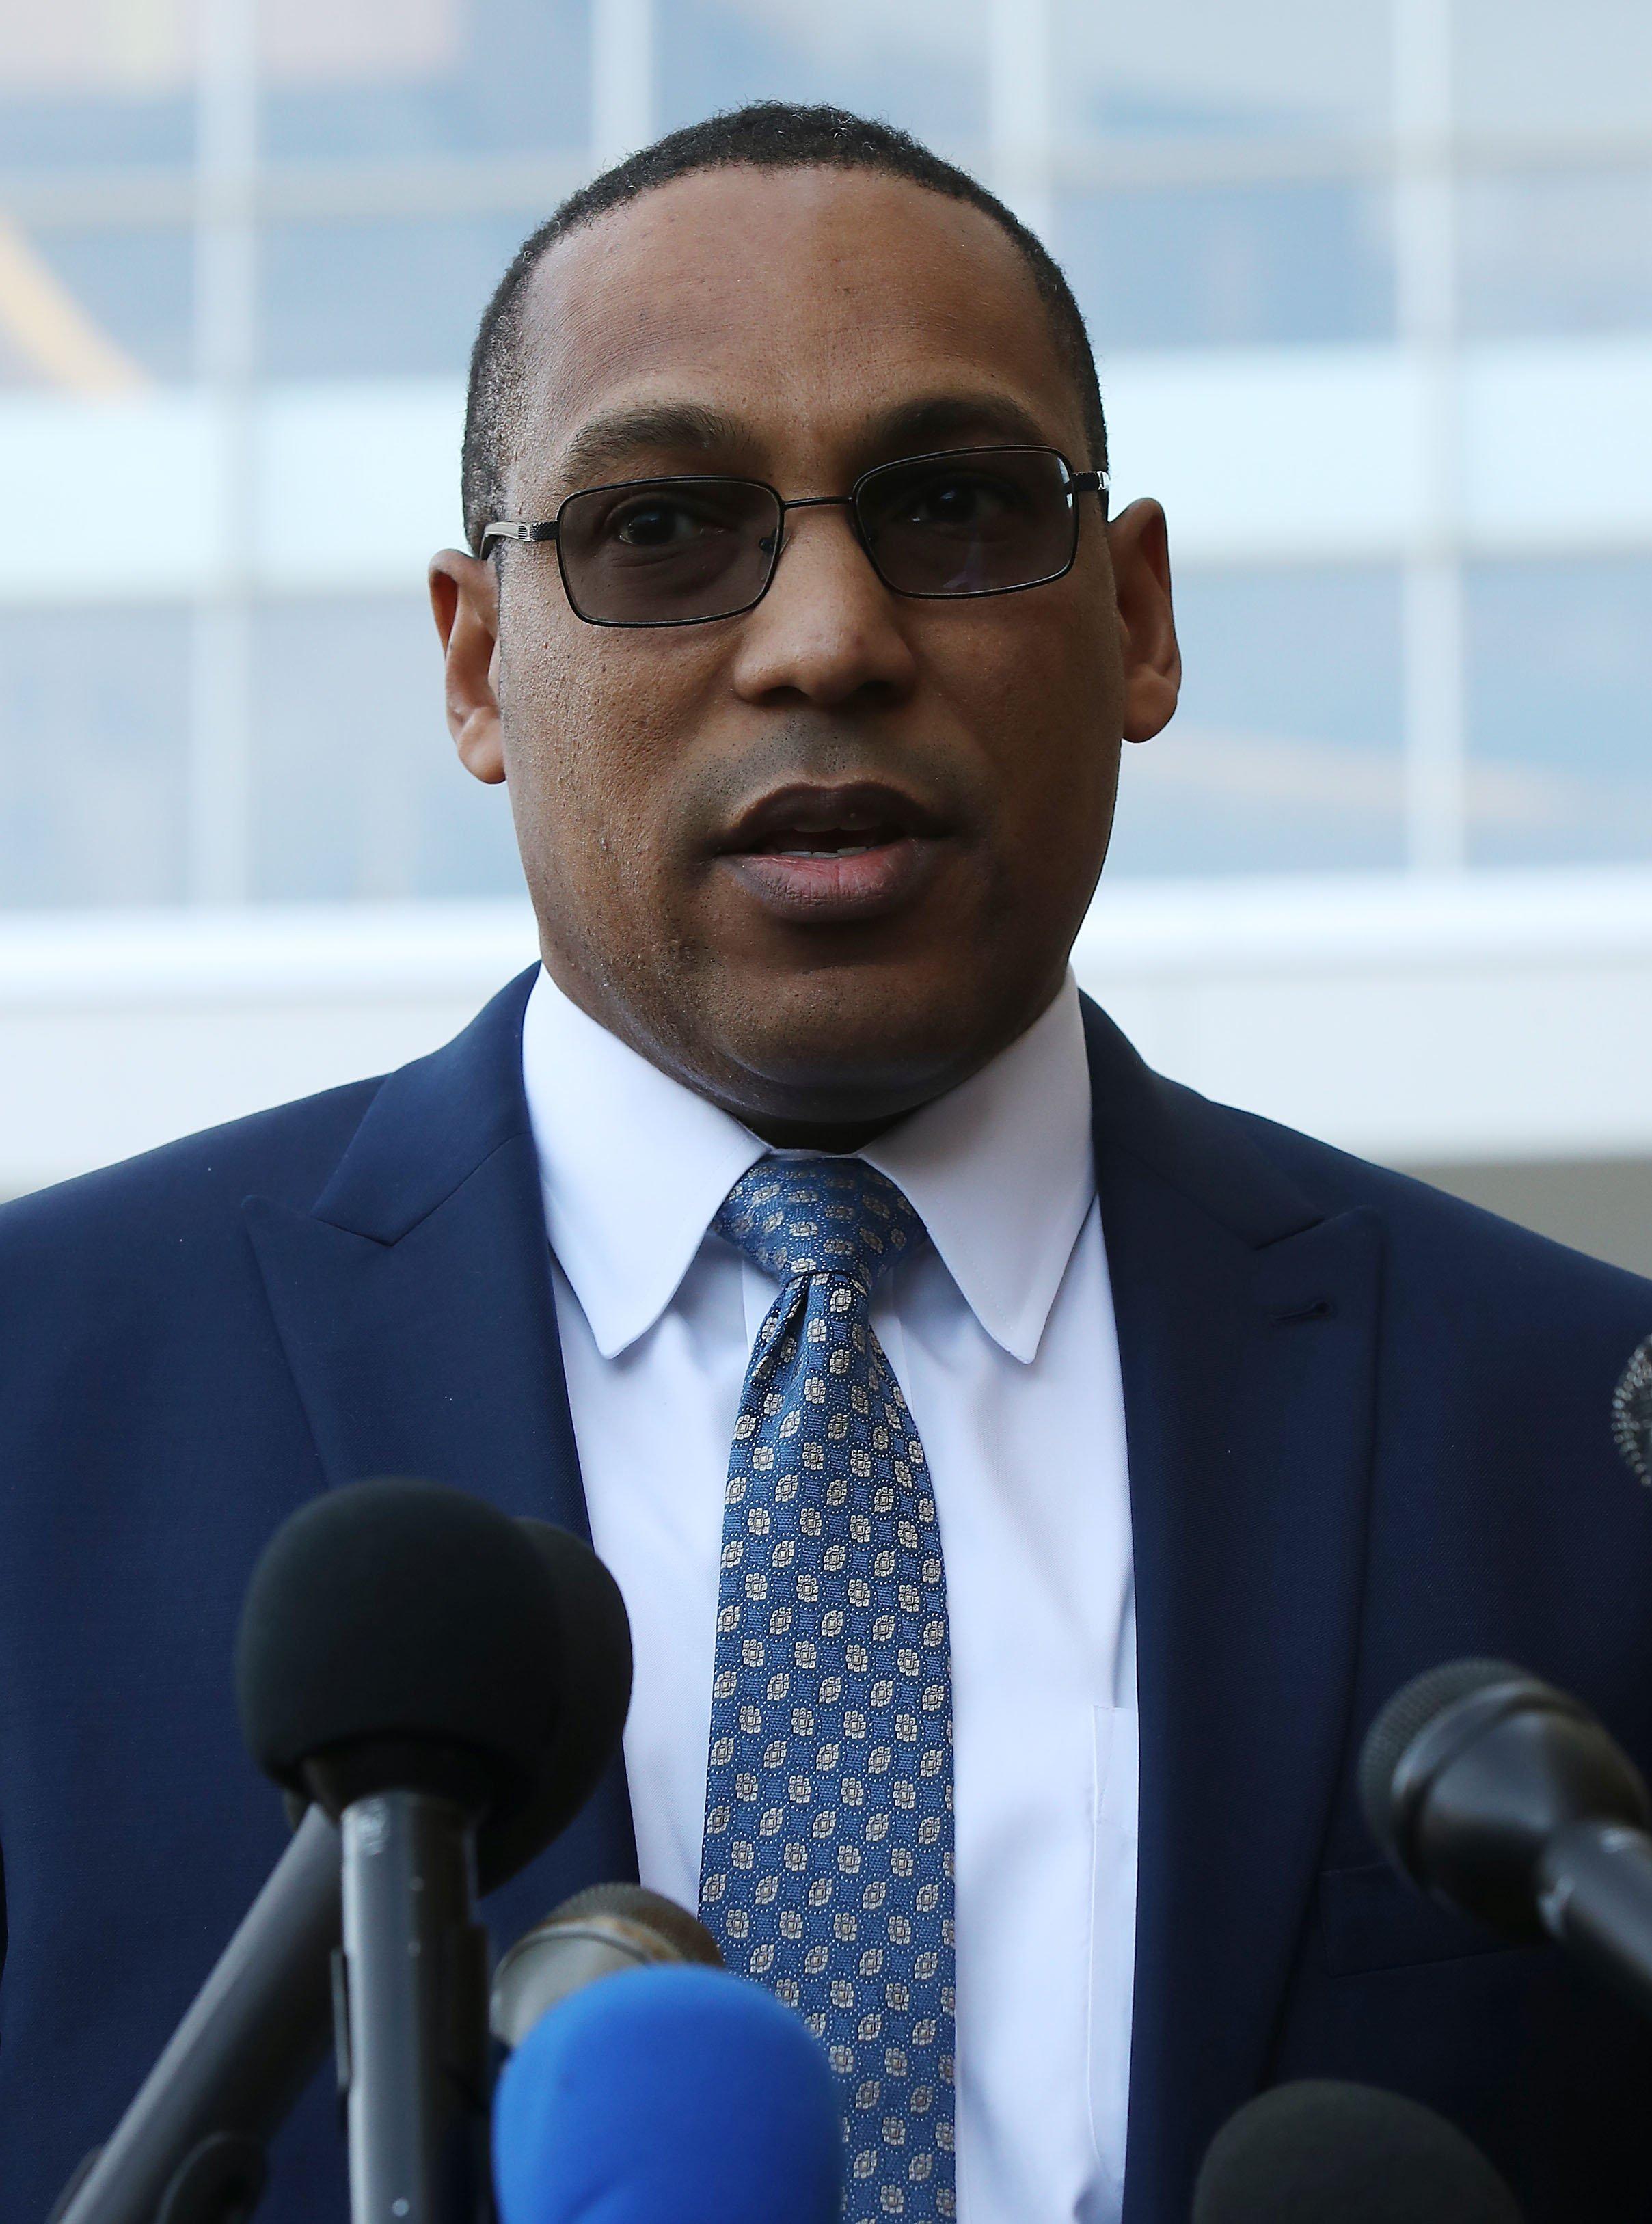 BI Special Agent Gordon Johnson addressing the media regarding Christopher Hasson   Photo: Getty Images